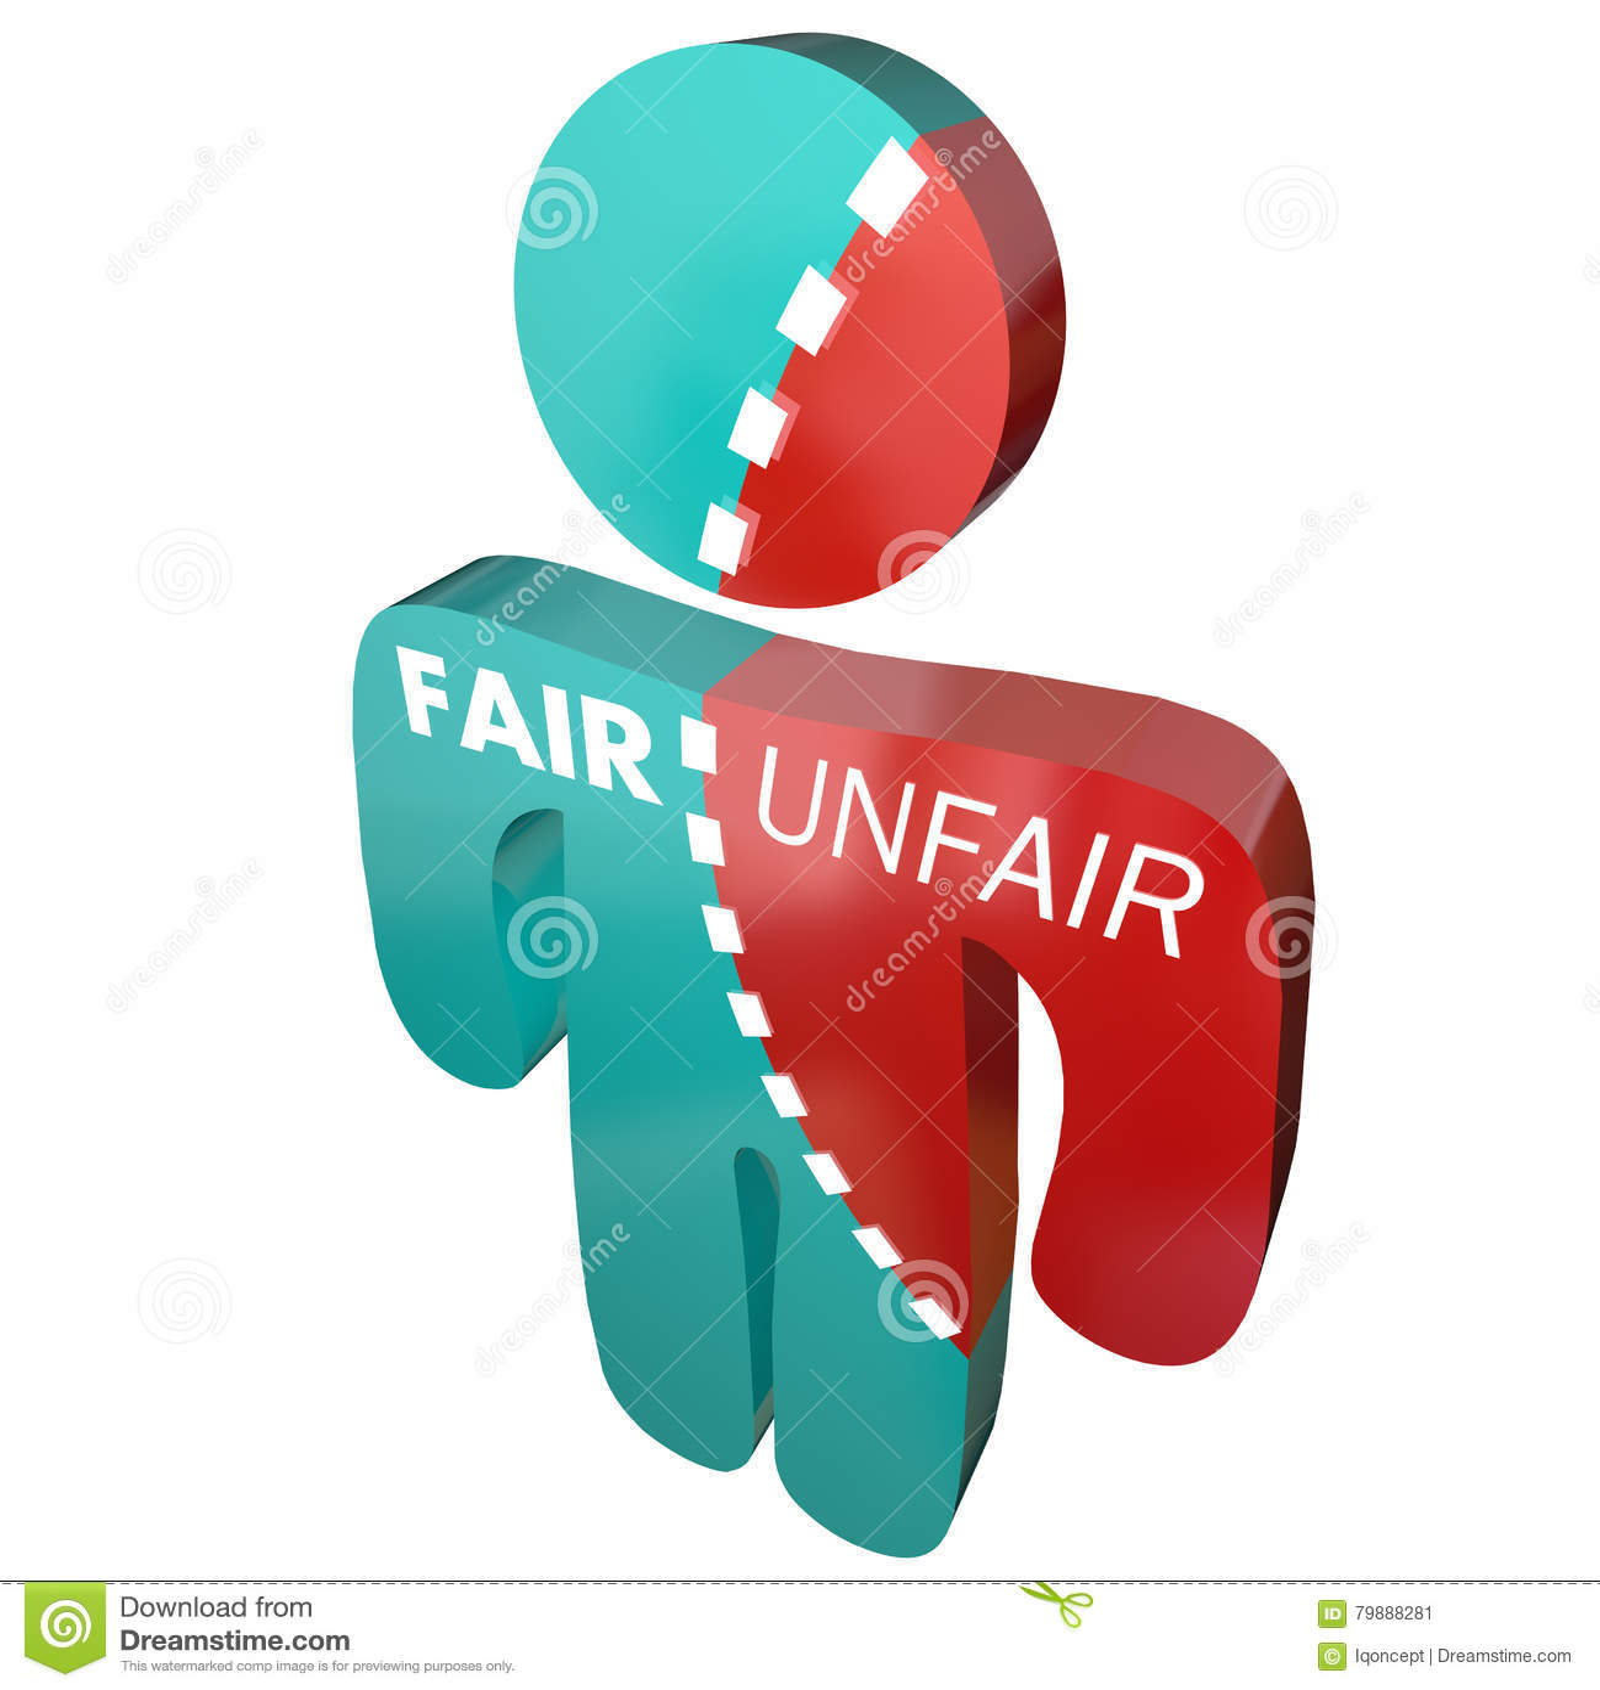 fair or unfair Form f2—unfair dismissal application fair work act 2009, s394 this is an application to the fair work commission for an unfair dismissal remedy in.